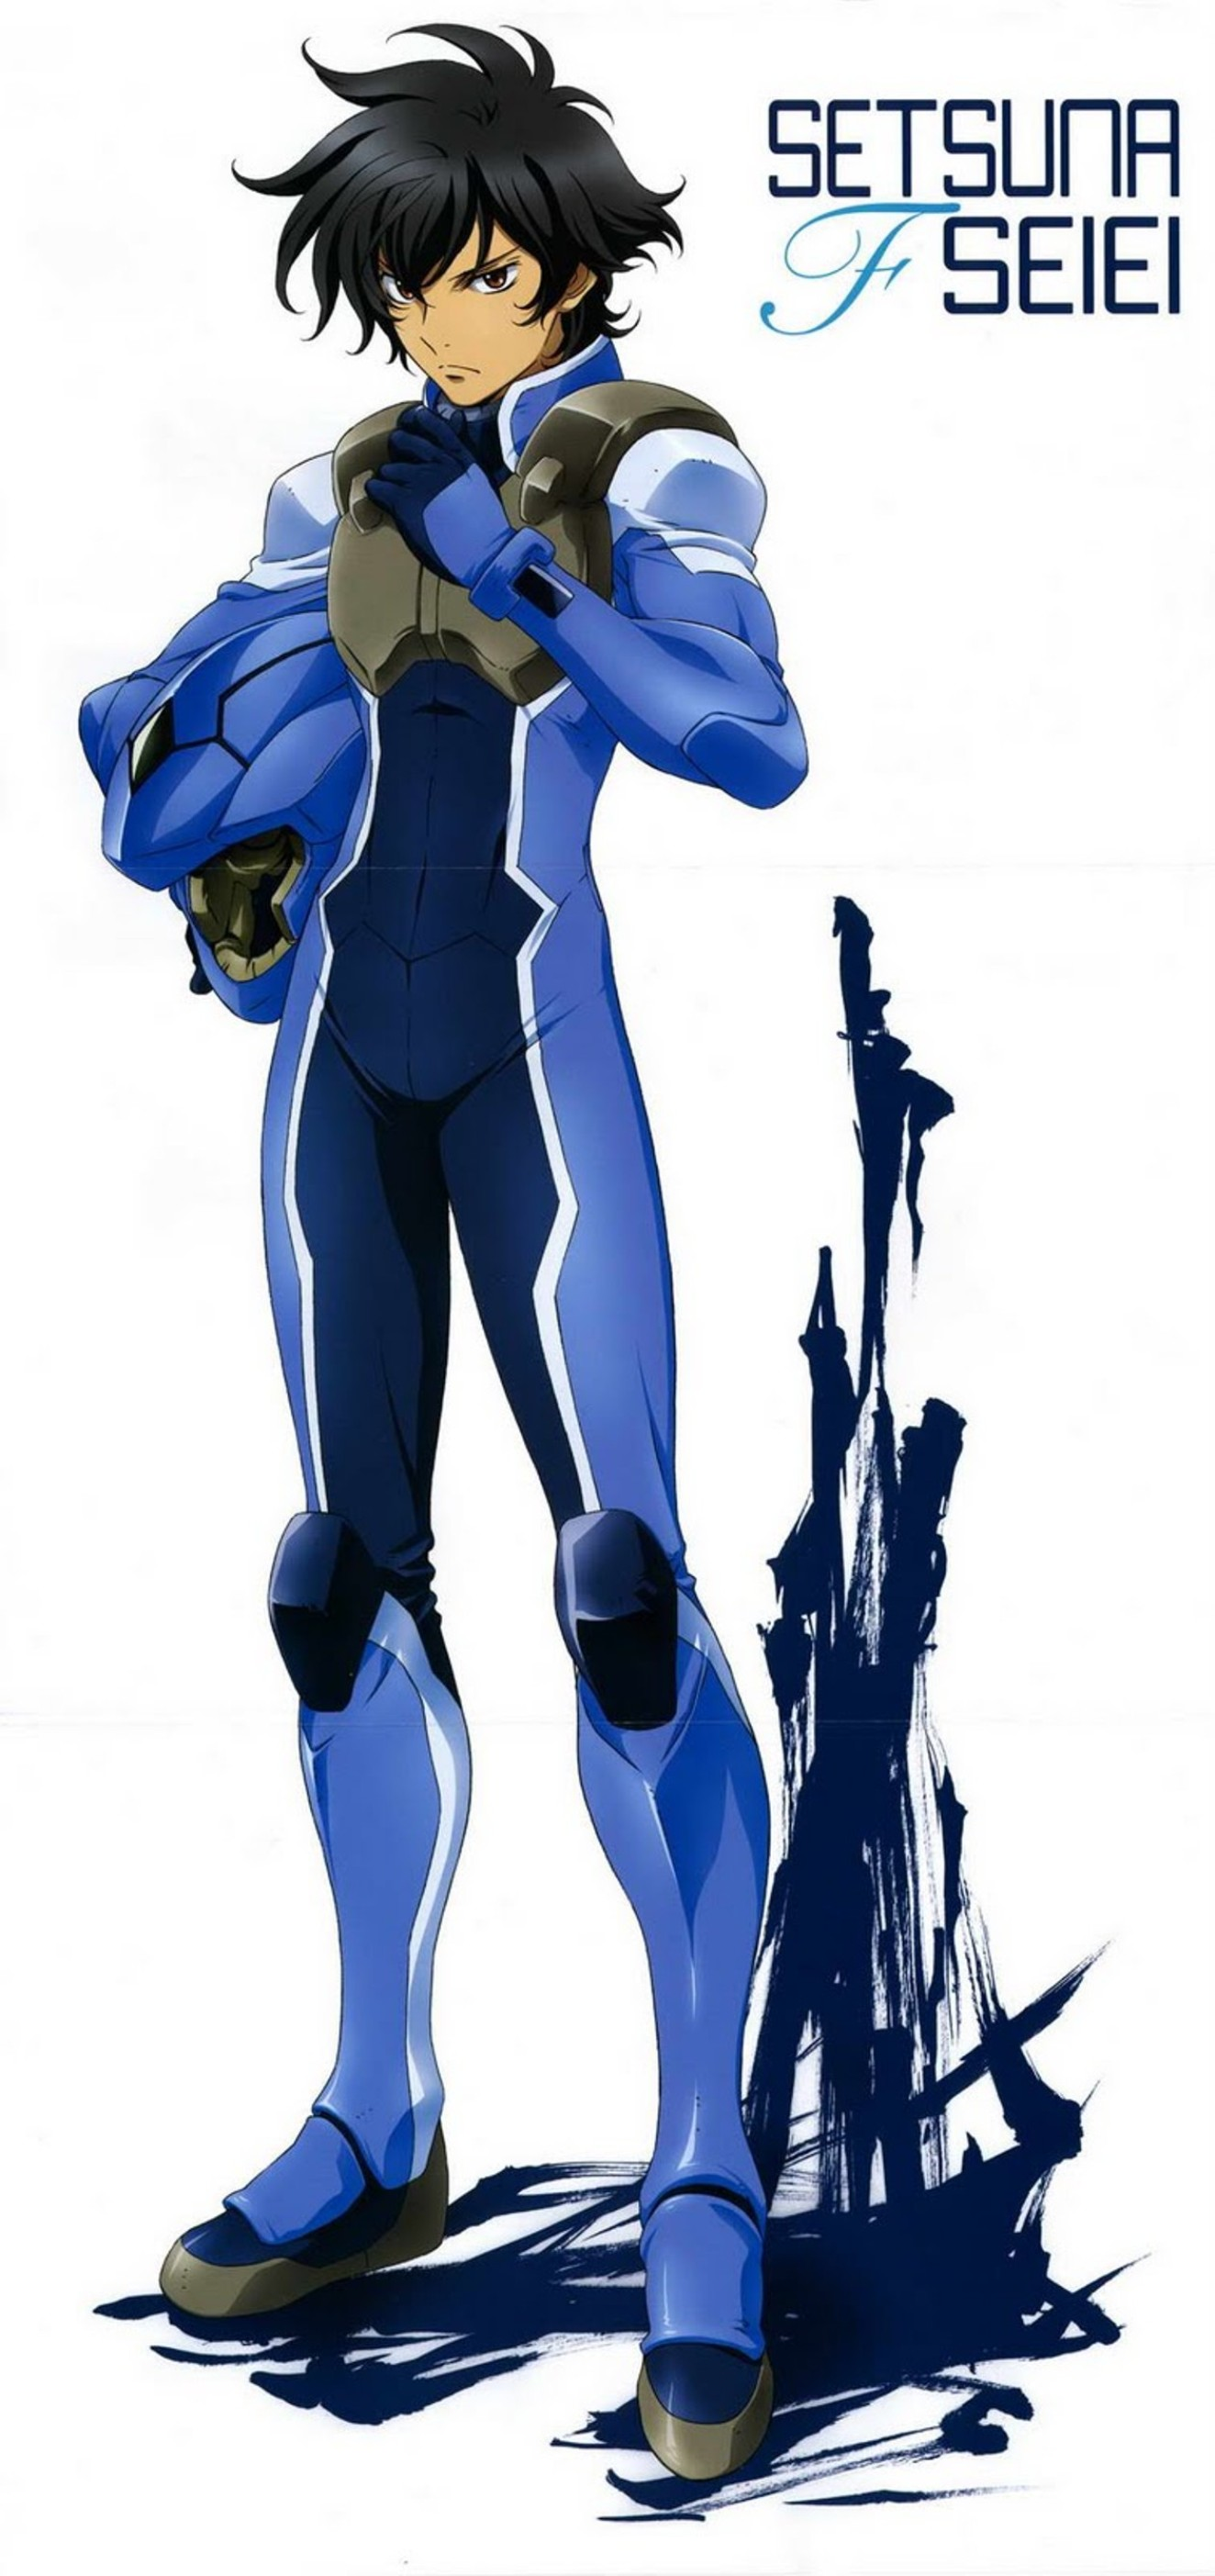 Setsuna F. Seiei - Mobile Suit Gundam 00 - Image #123147 ...